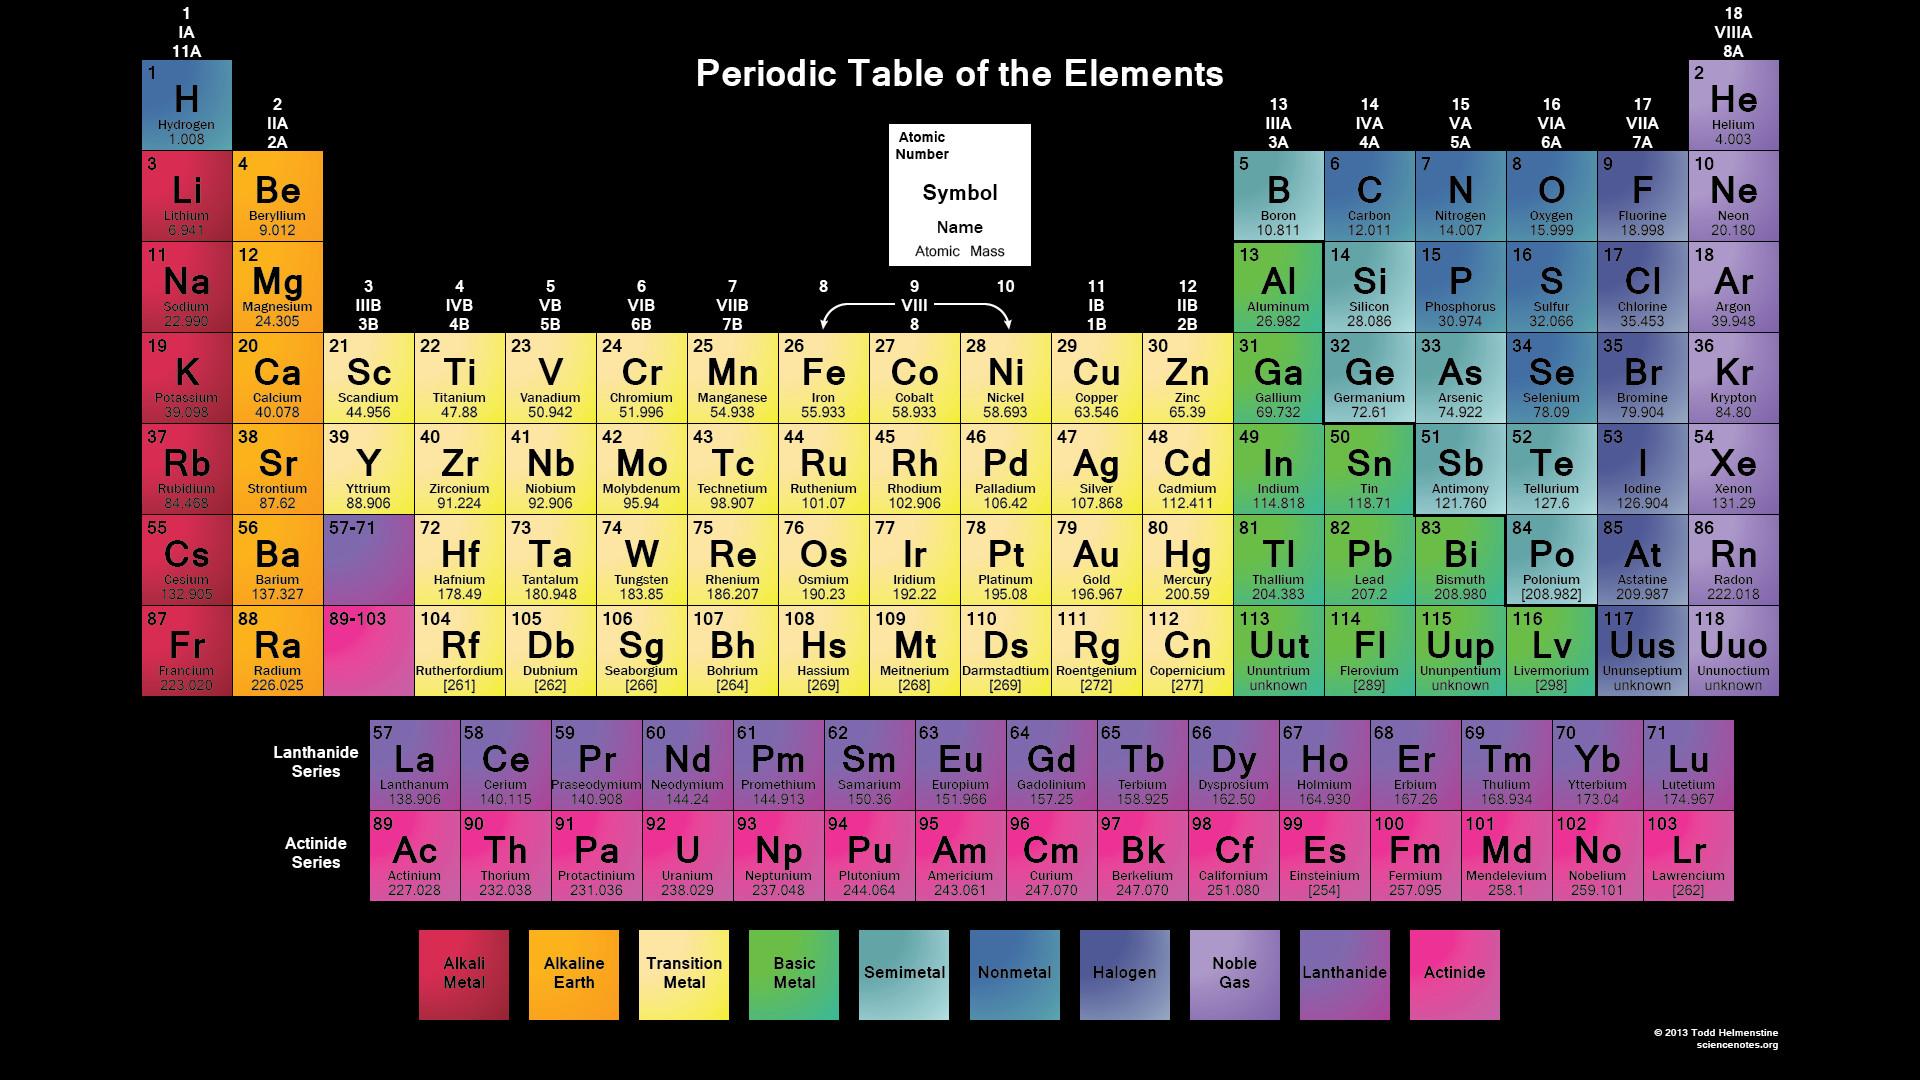 Periodic table of elements desktop wallpaper 1920x1080 periodic table wallpaper gamestrikefo Gallery